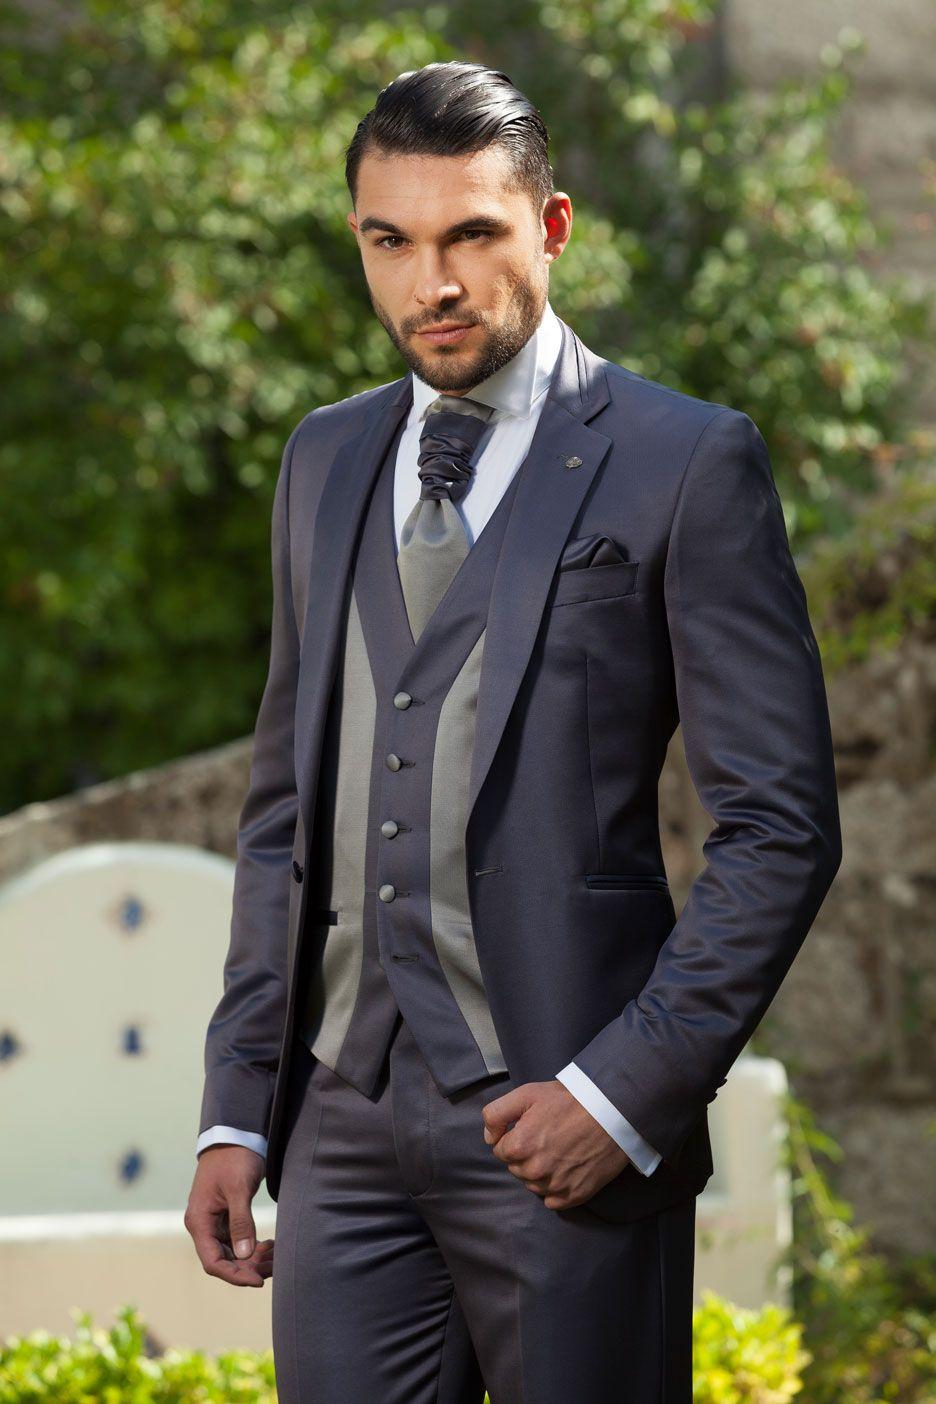 Felix ramiro fashion men style pinterest men dress and